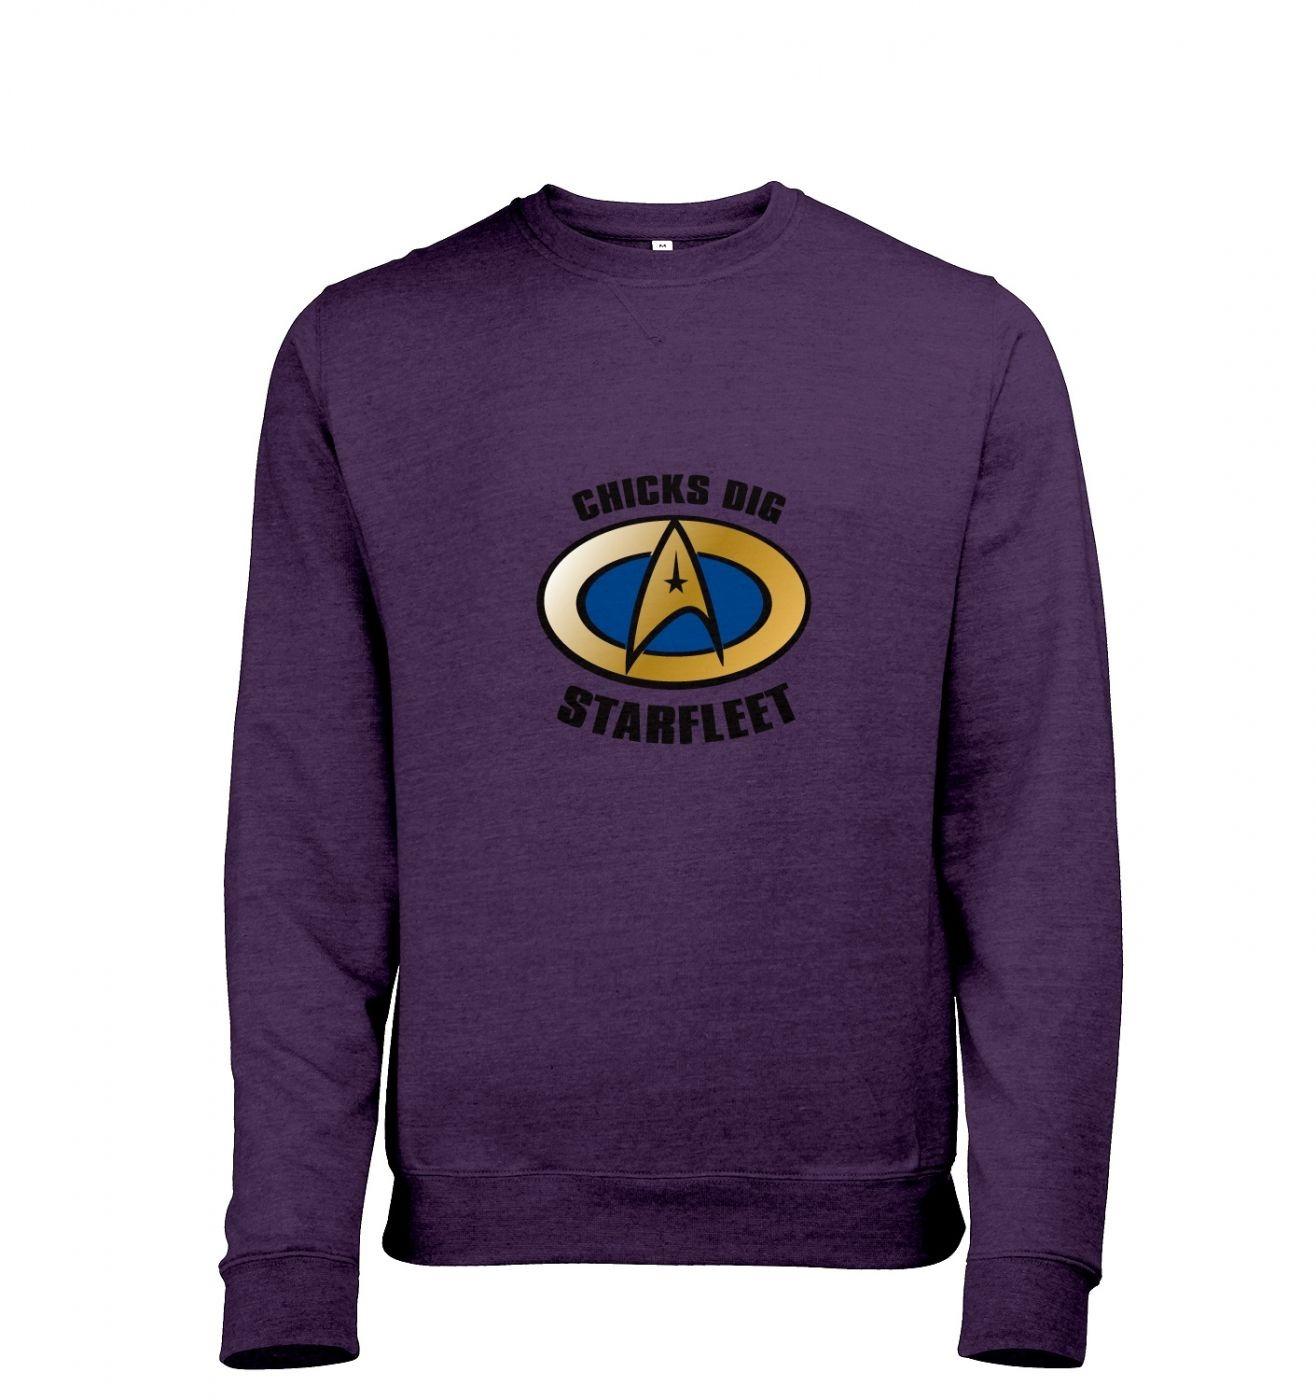 Chicks Dig Starfleet heather sweatshirt